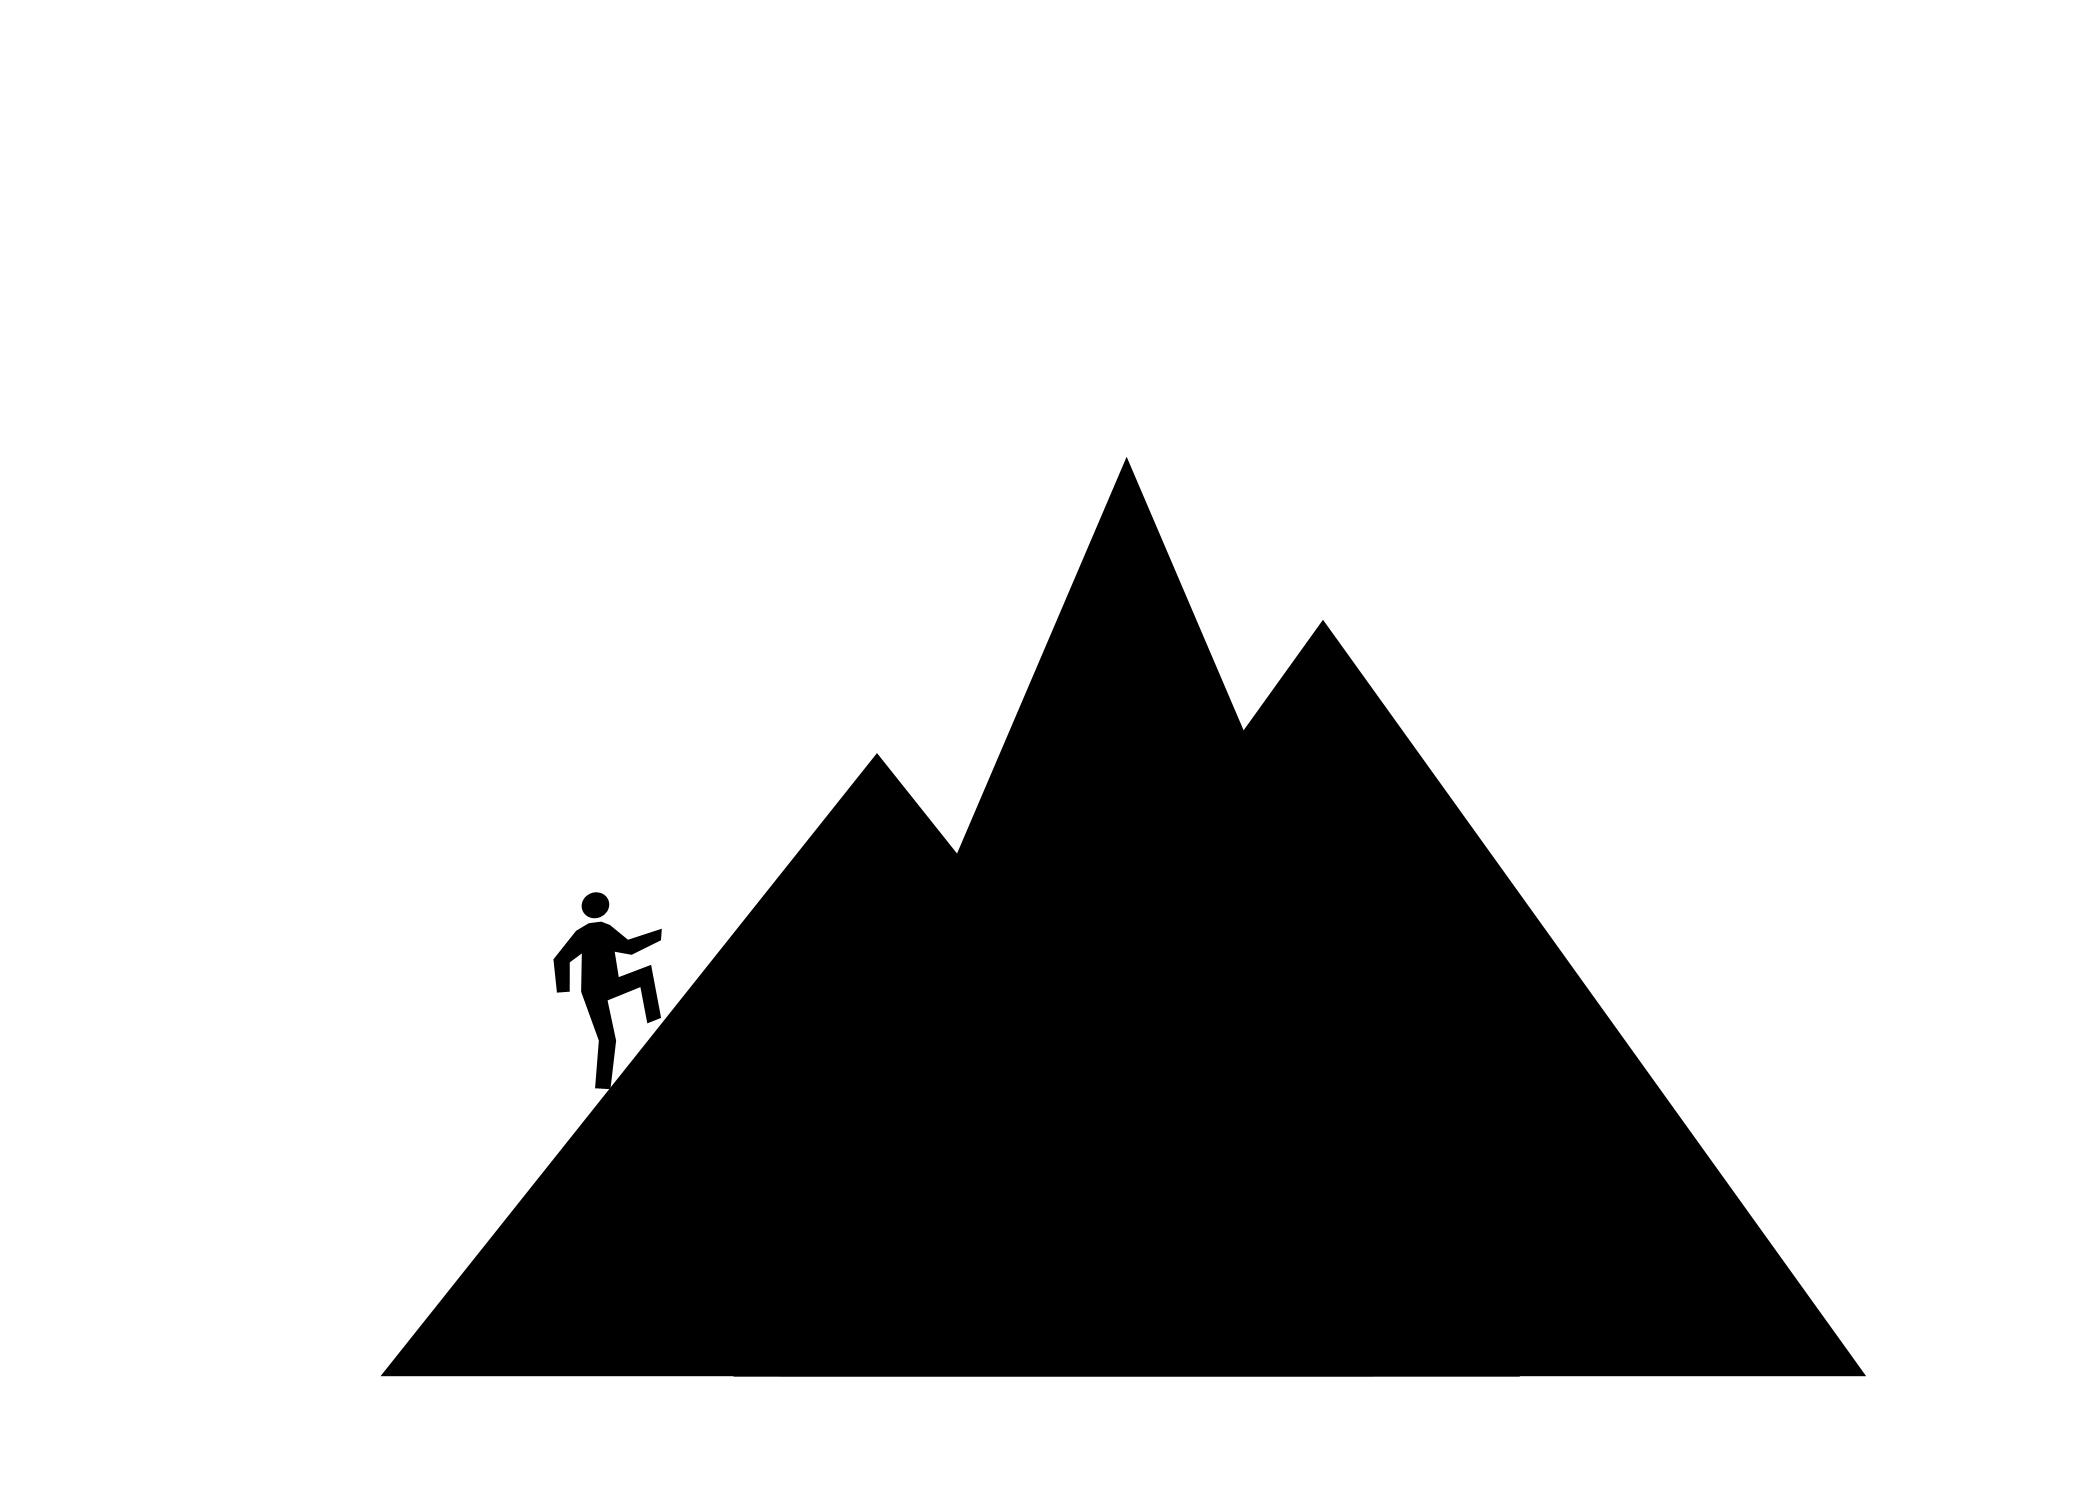 2100x1500 Mountain Silhouette Clip Art